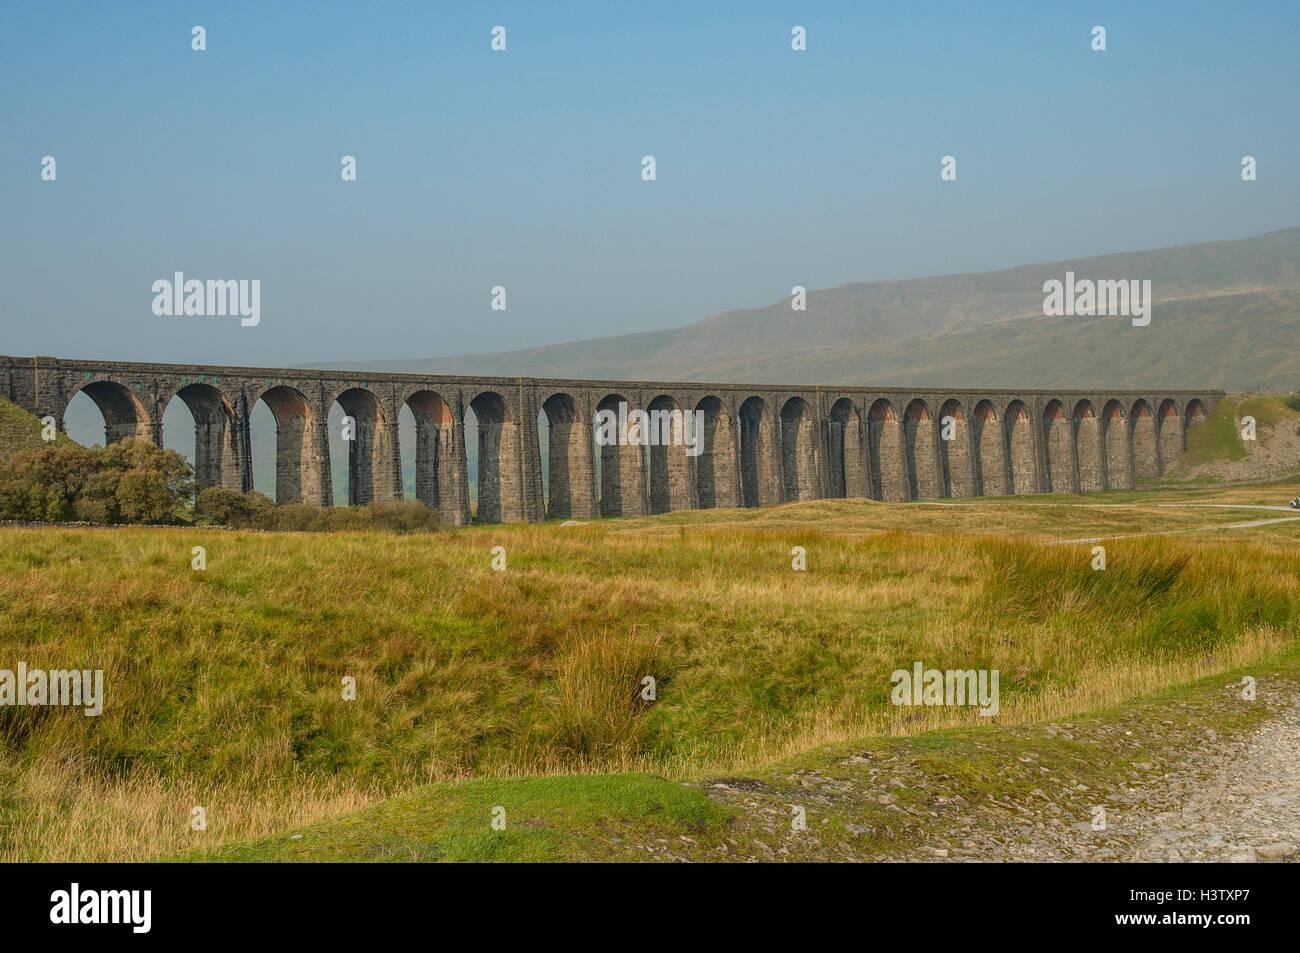 Ribblehead Viaduct, Yorkshire, England - Stock Image